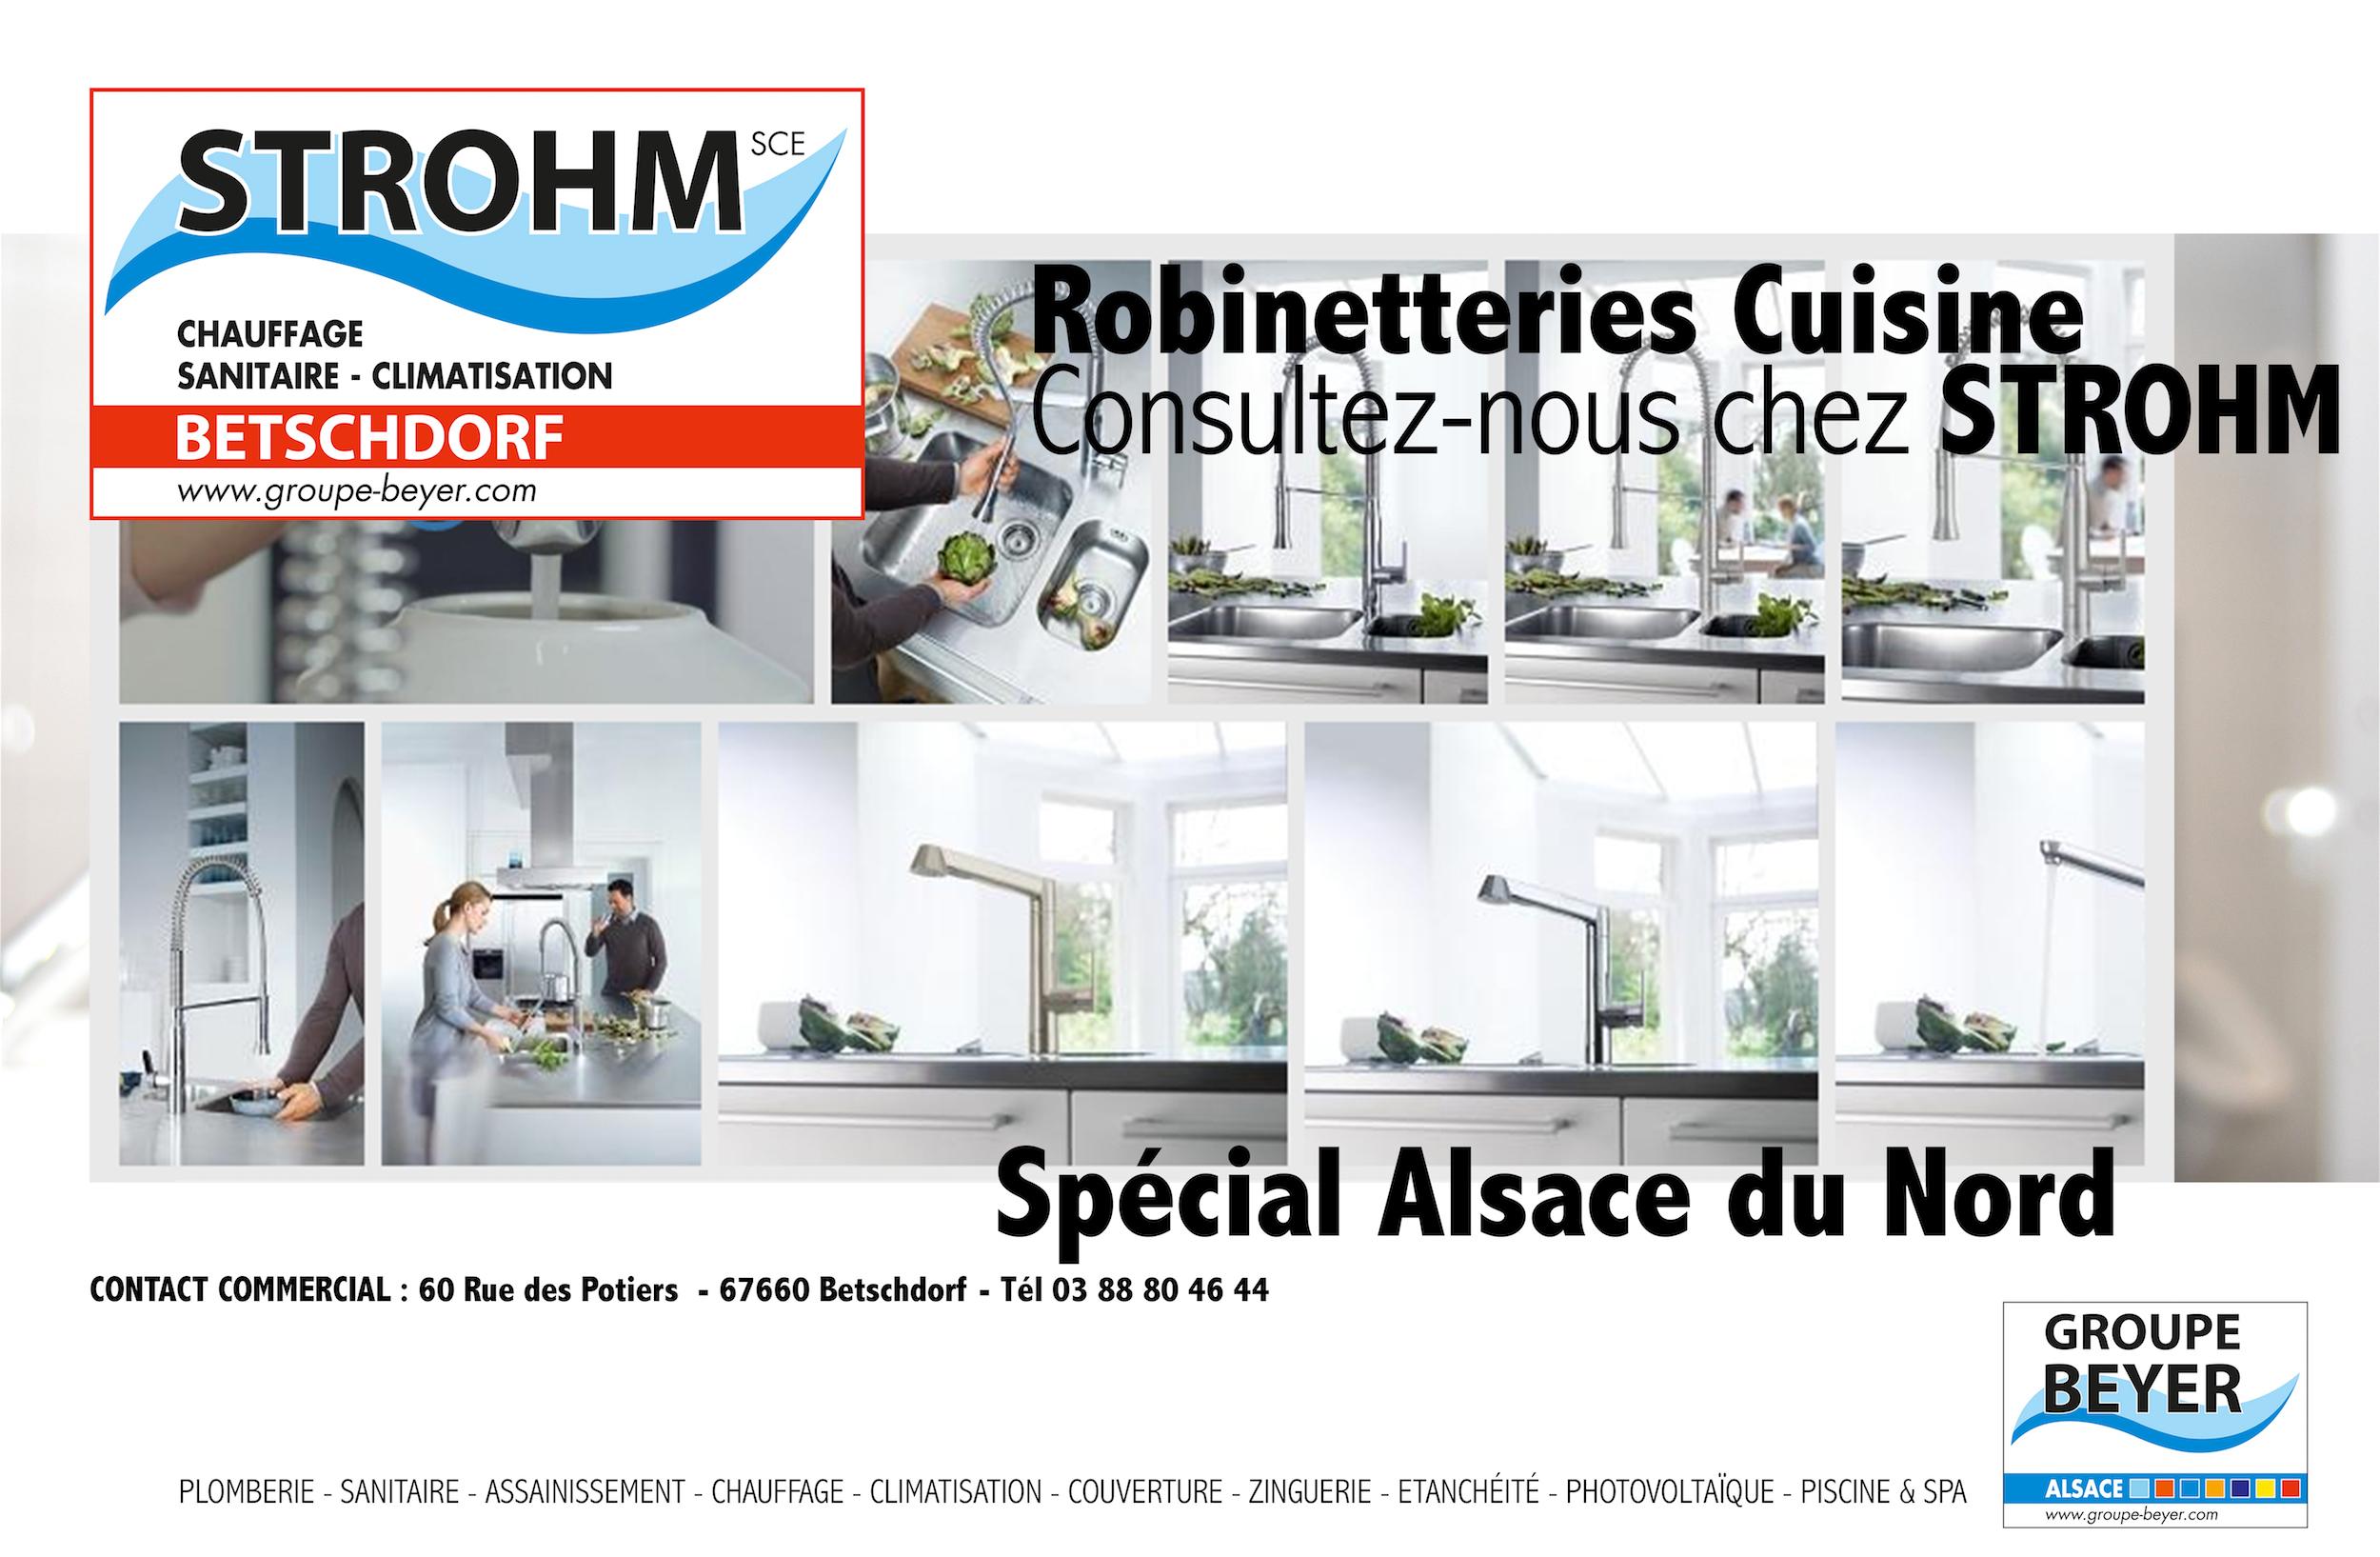 strohm_betschdorf_groupe_beyer_sanitaire_ventilation_couverture_1666Robinetteries_Cuisine_strohm_beyer